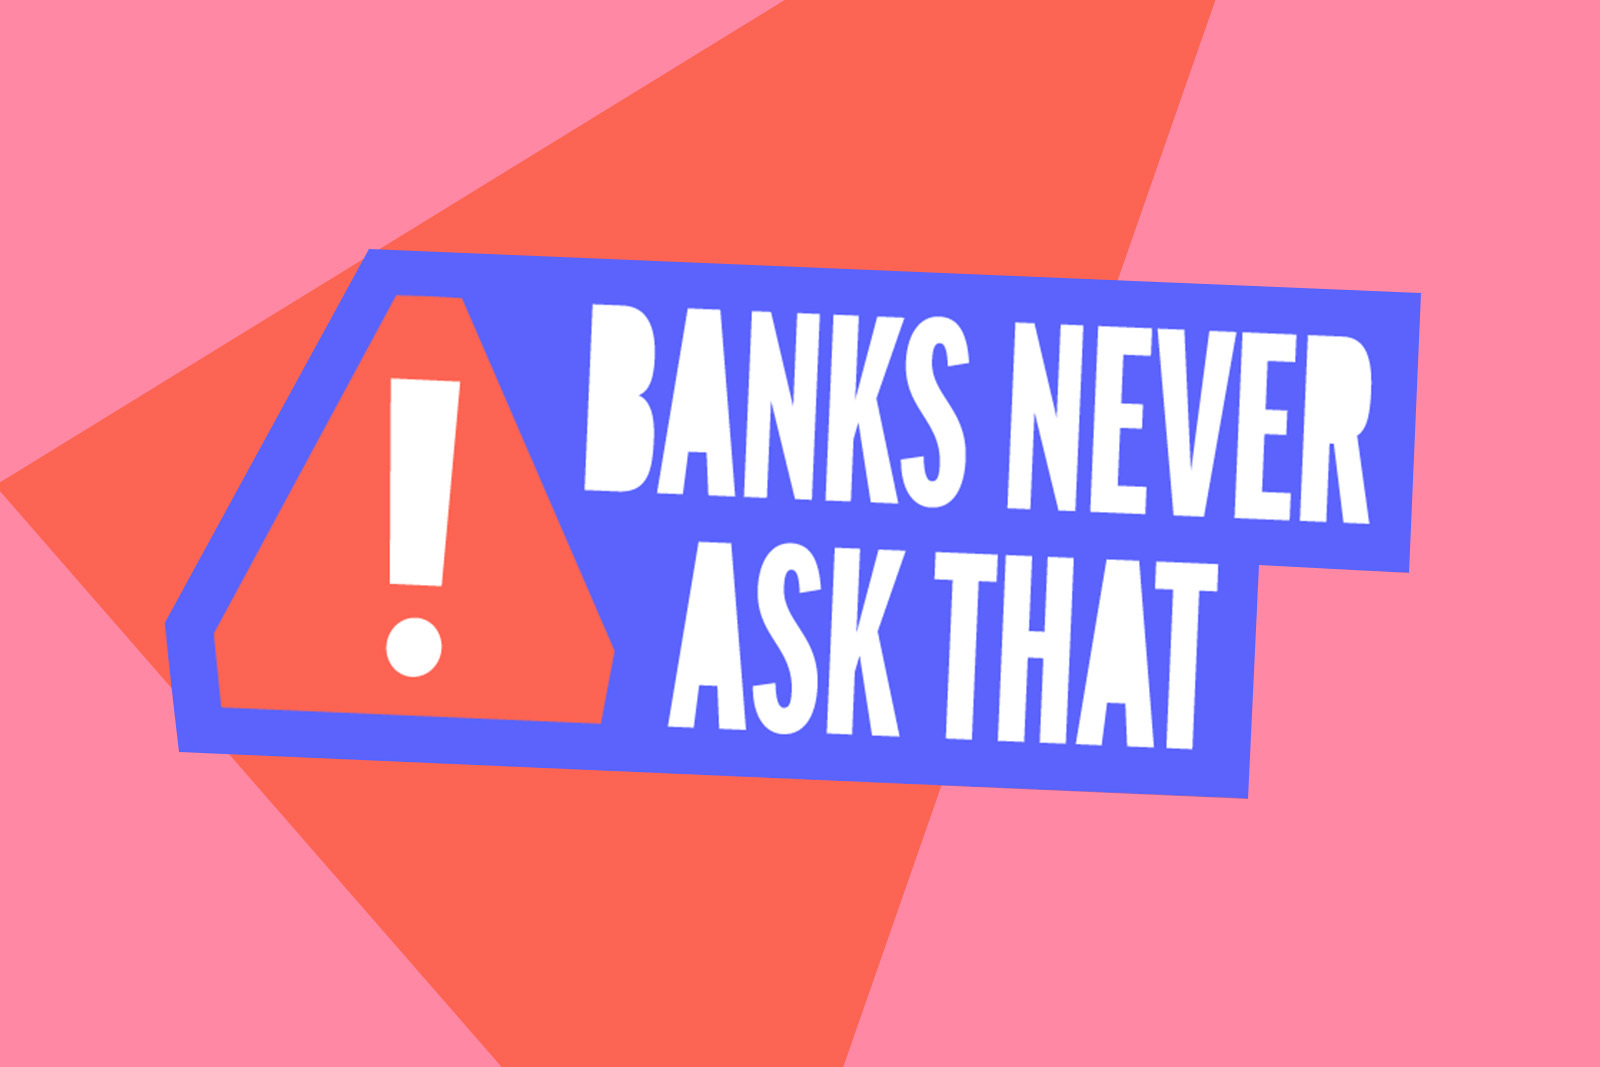 #BanksNeverAskThat